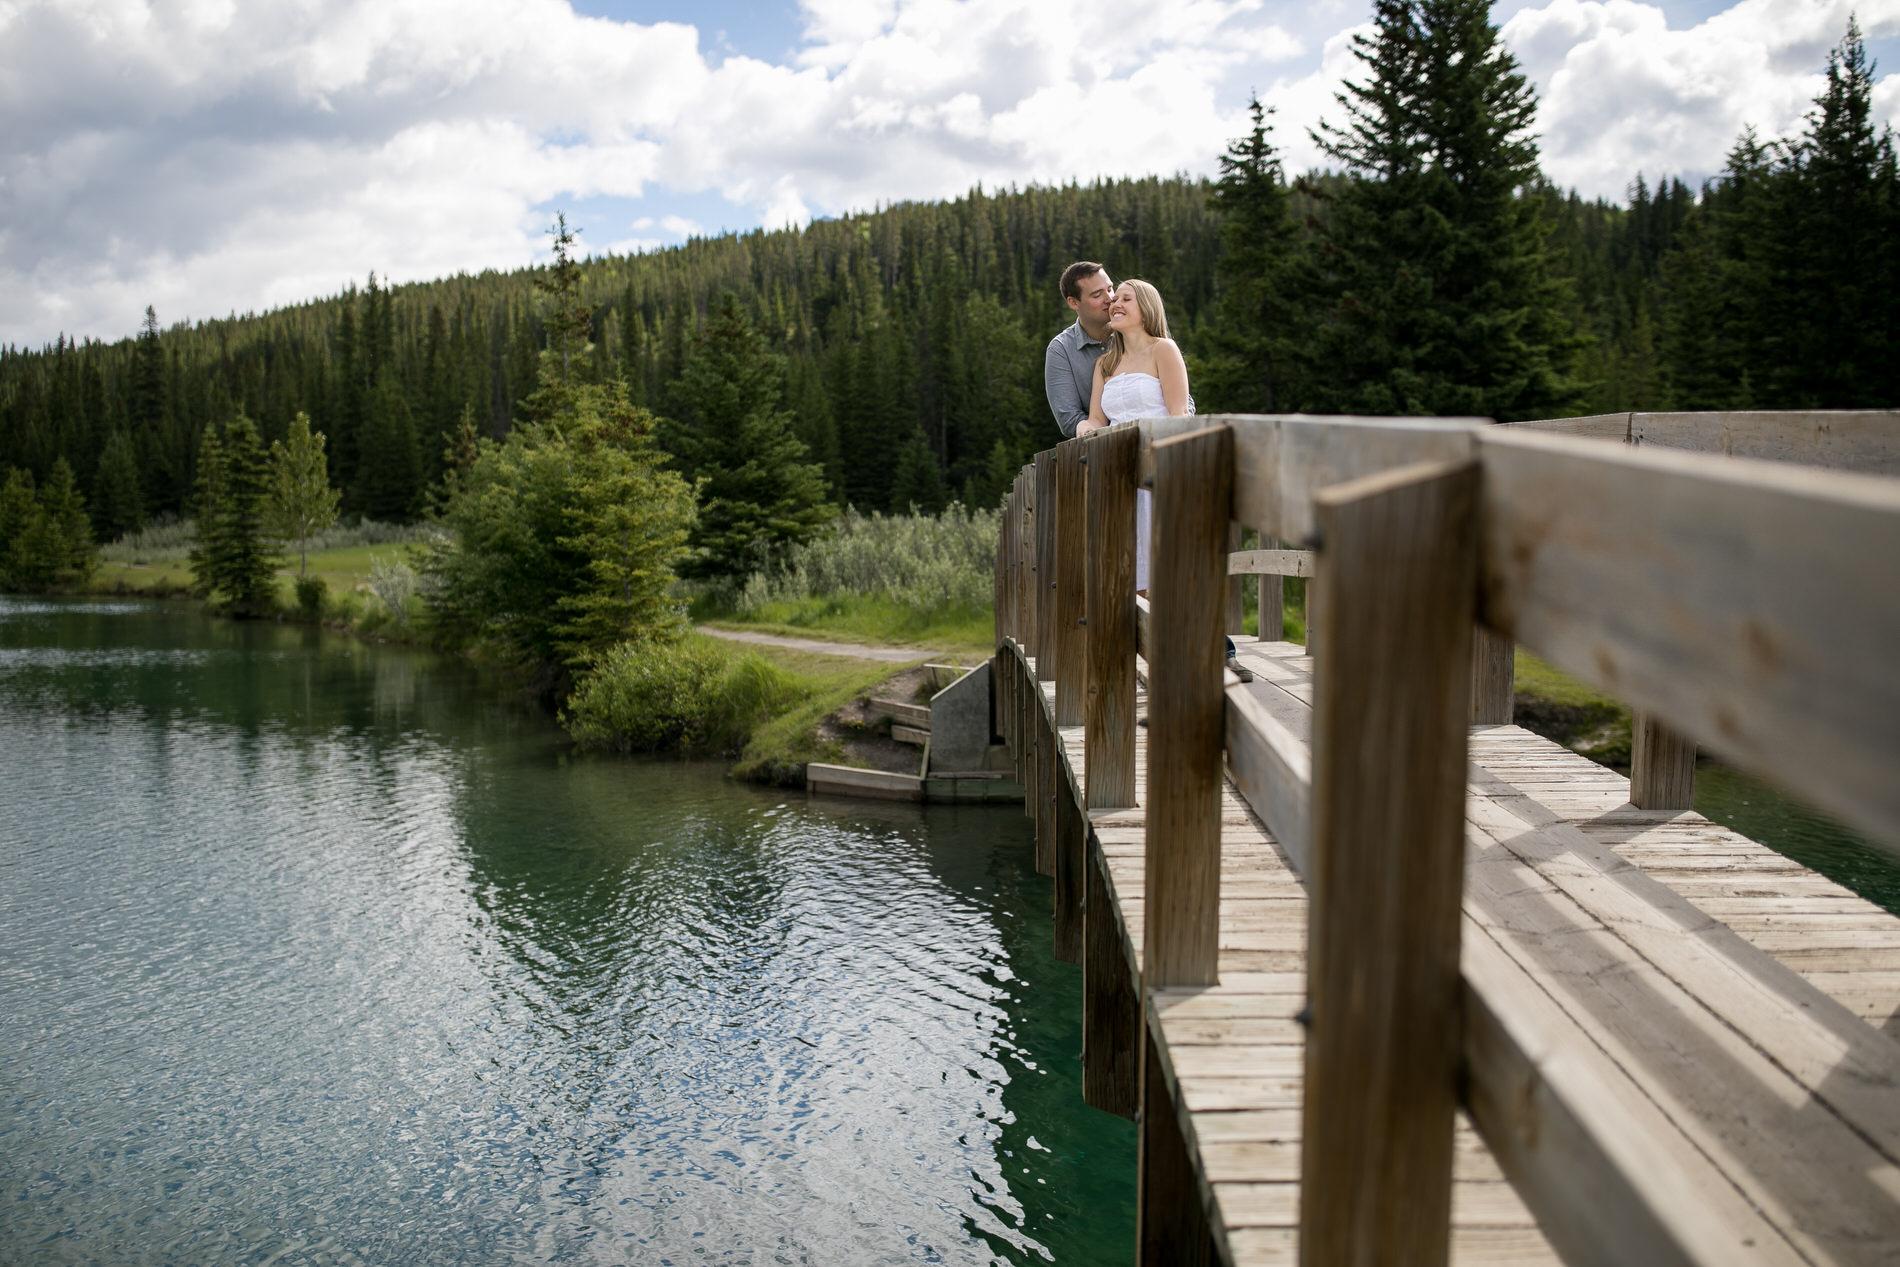 Engagement Photos Banff National Park